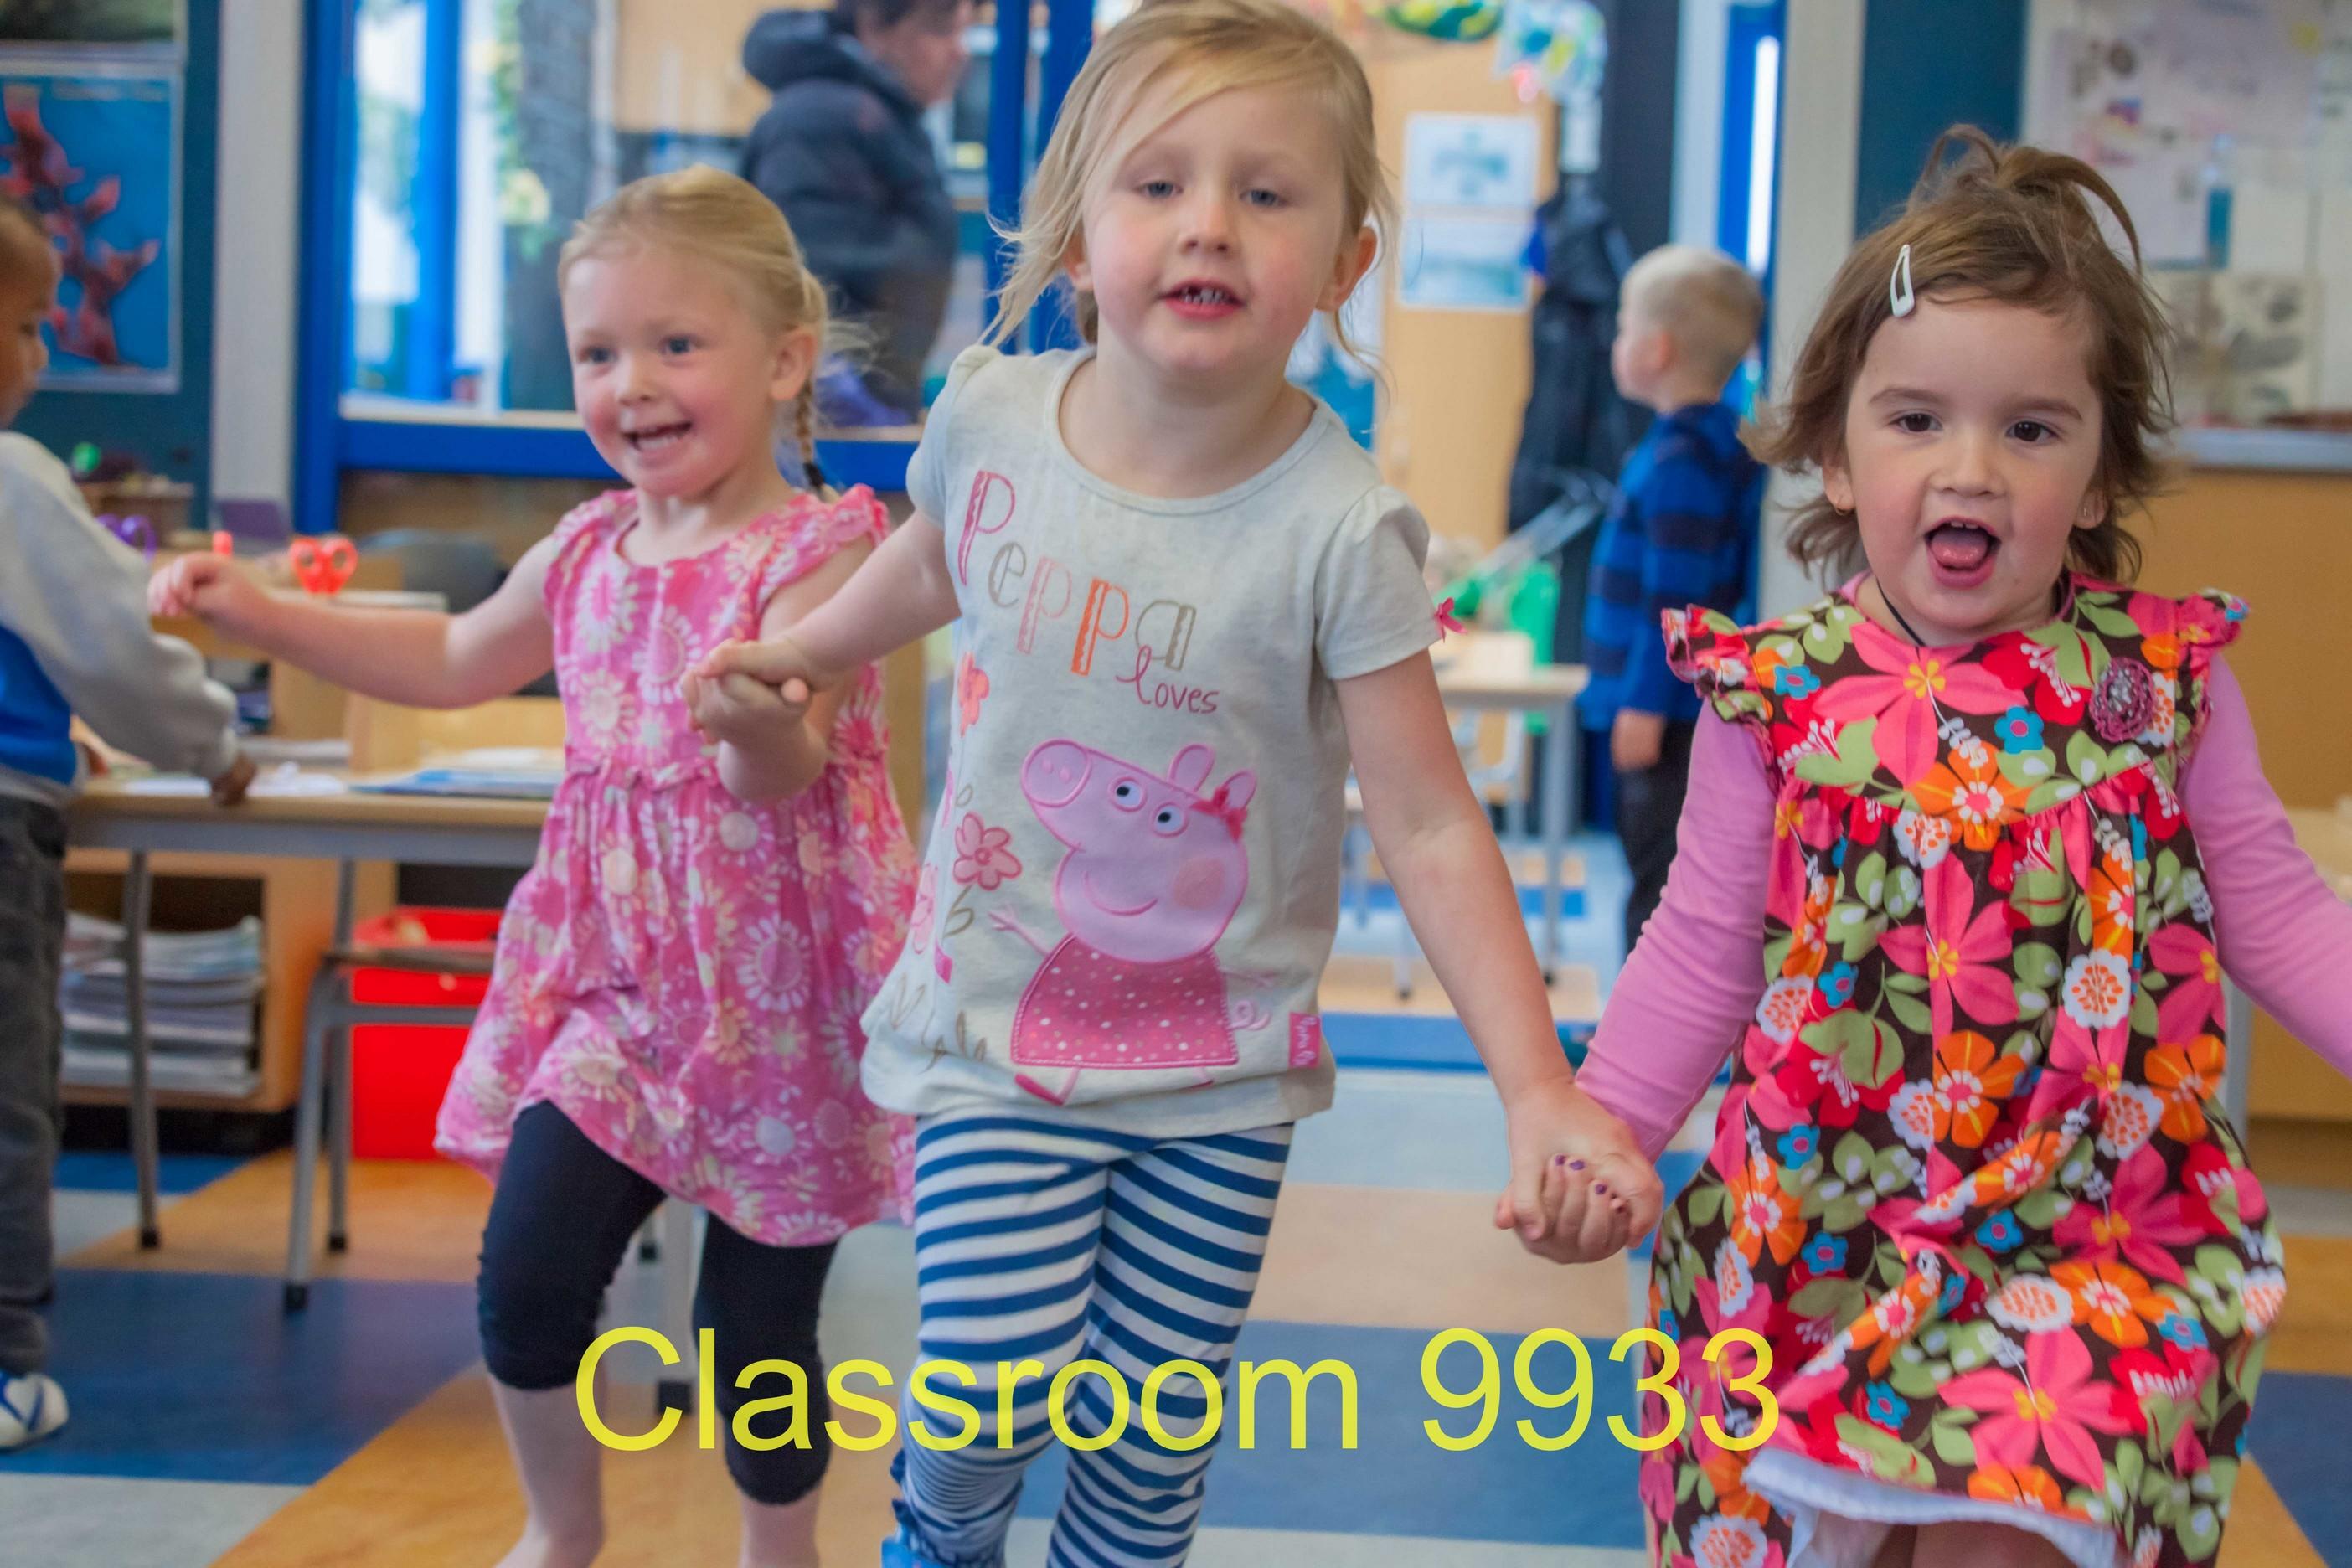 Classroom 9933